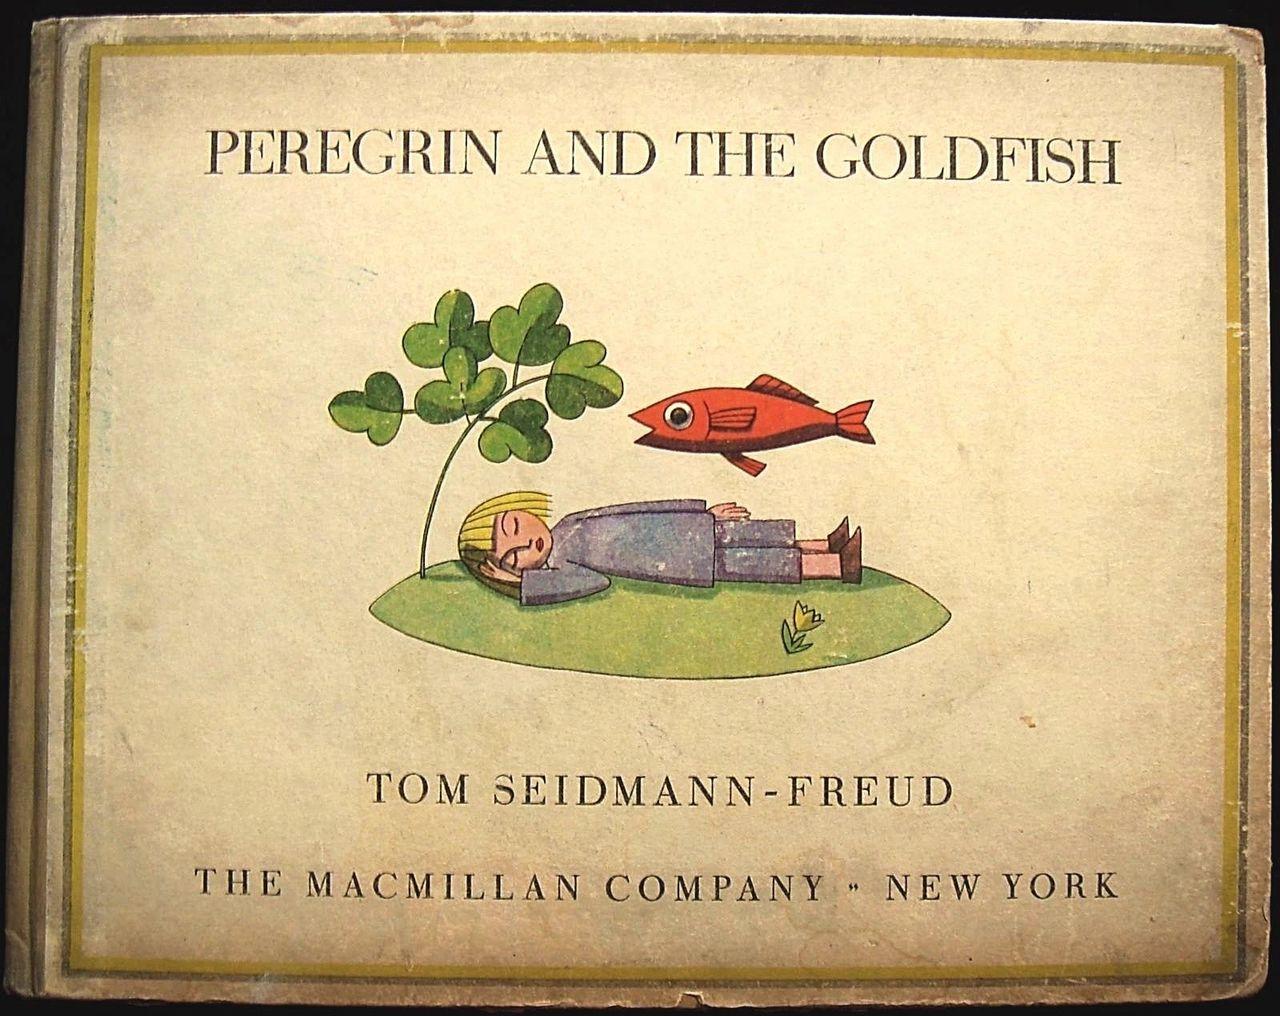 PEREGRIN & THE GOLDFISH, Tom Seidmann-Freud - 1929 [1st Ed]